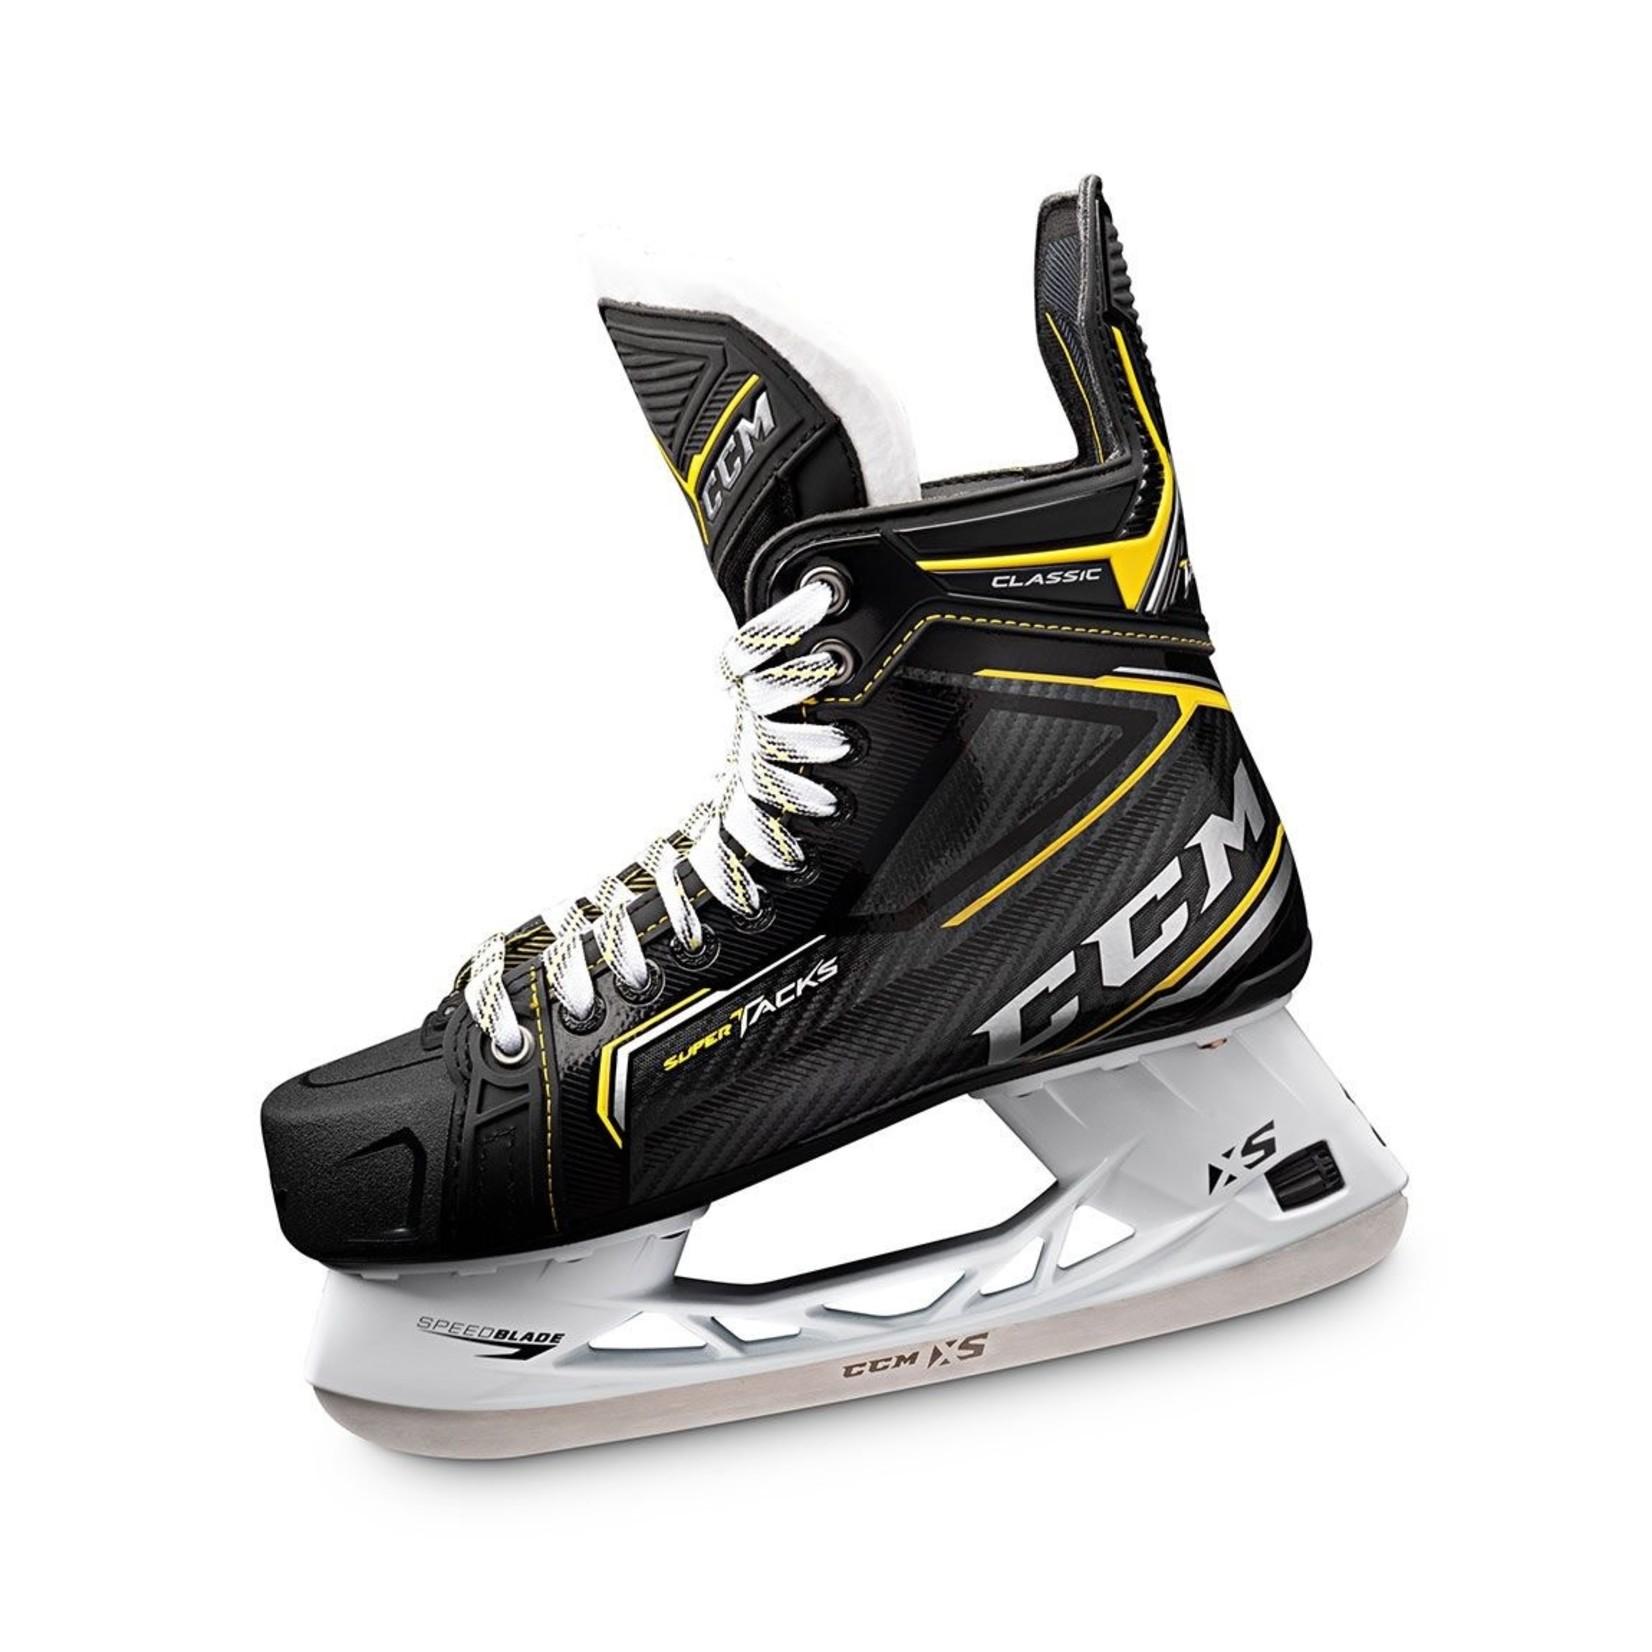 CCM CCM Hockey Skates, Super Tacks Classic, Senior